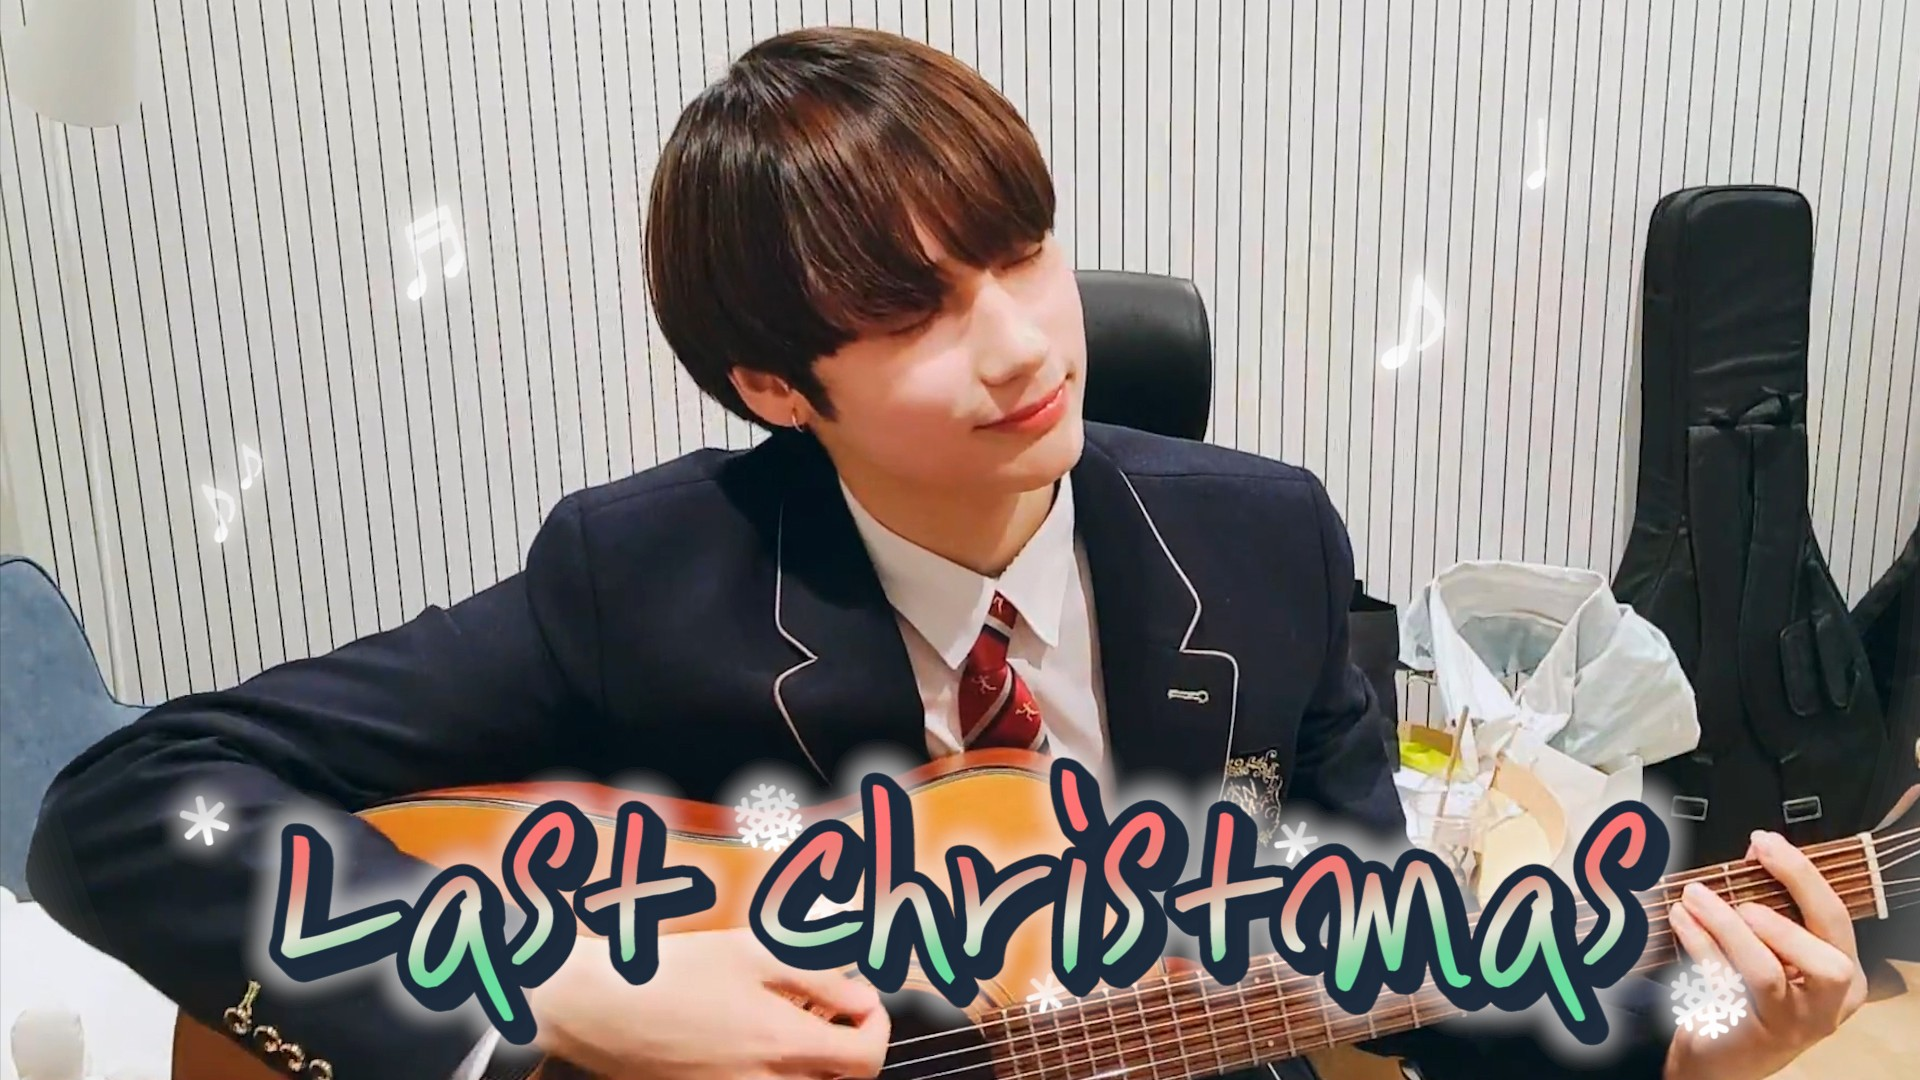 [TXT] 휴닝이가 치는 곡이라면 한 곡 반복?🙅 극락 무한 반복🙆💞 (HUENINGKAI playing a guitar)